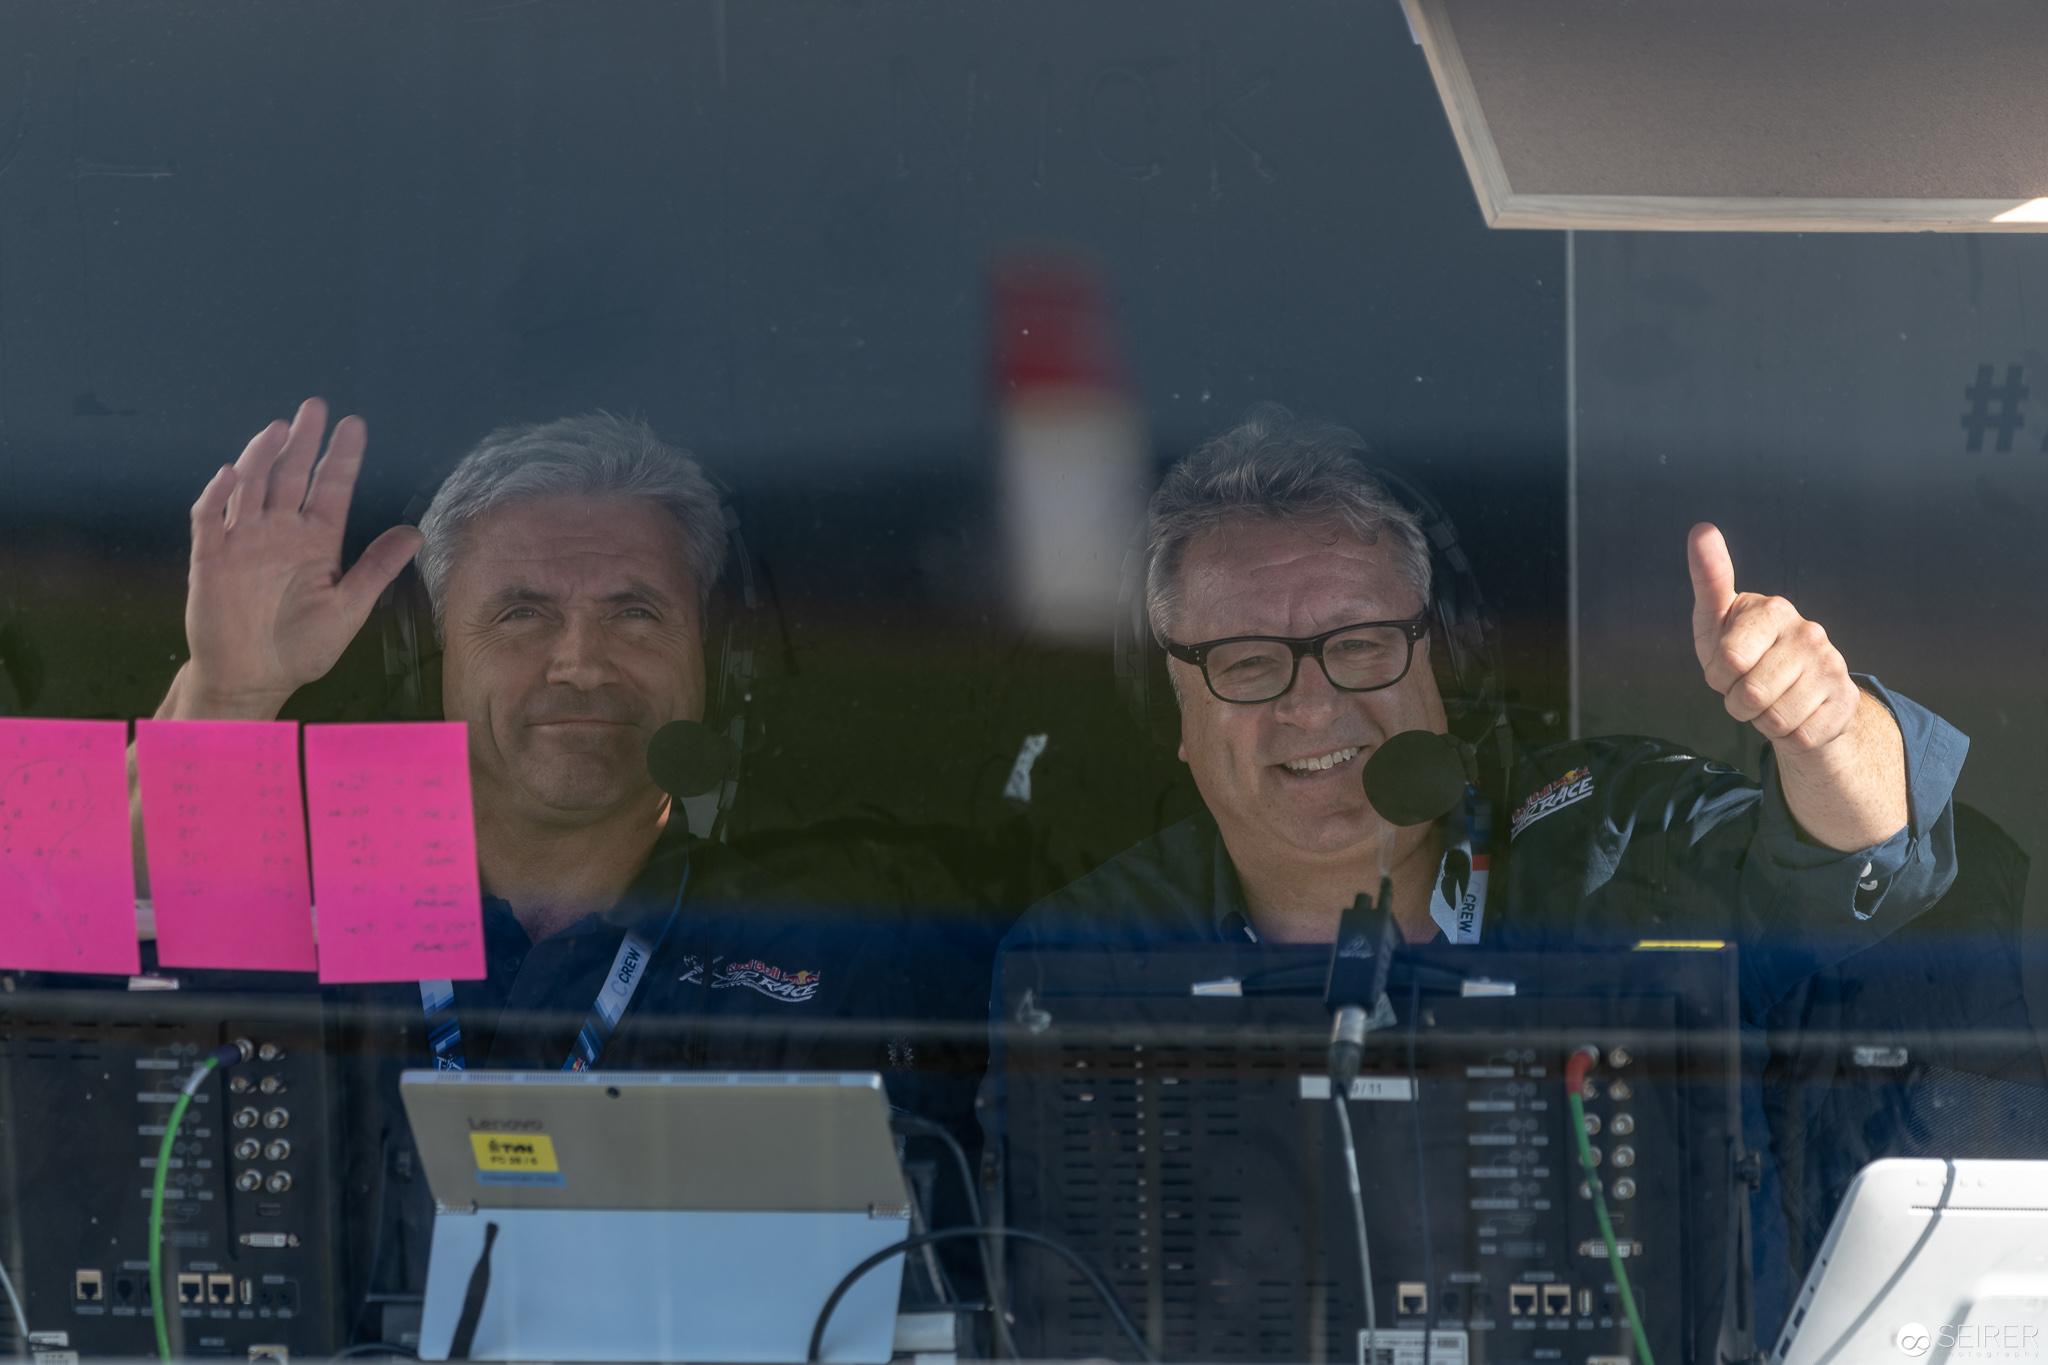 Red Bull Air Race Wiener Neustadt 2018